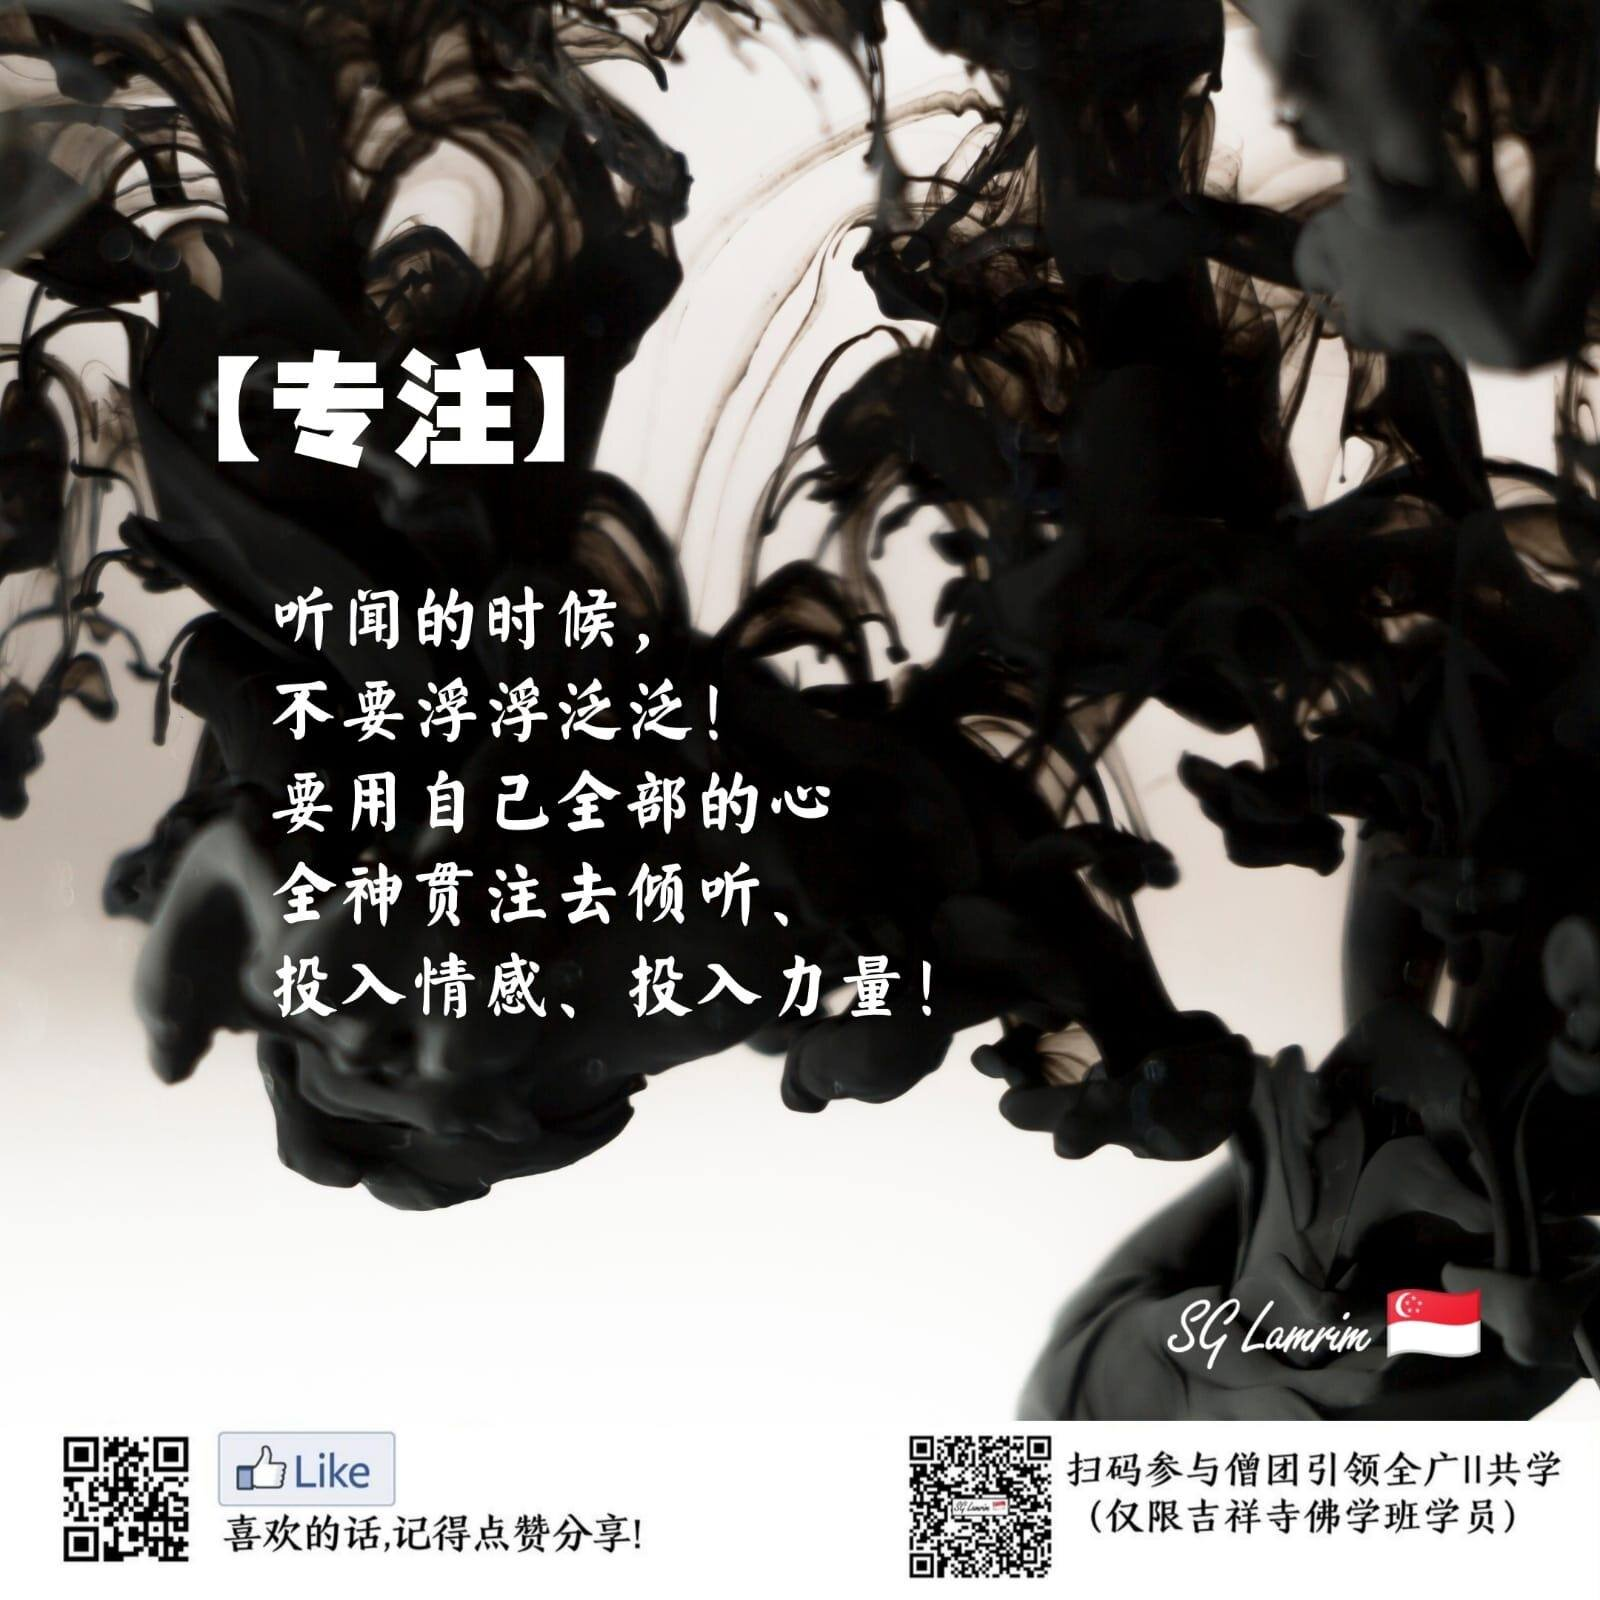 BW Monastery 吉祥寶聚寺 — SG Lamrim Reflections 新加坡全廣共學心得分享